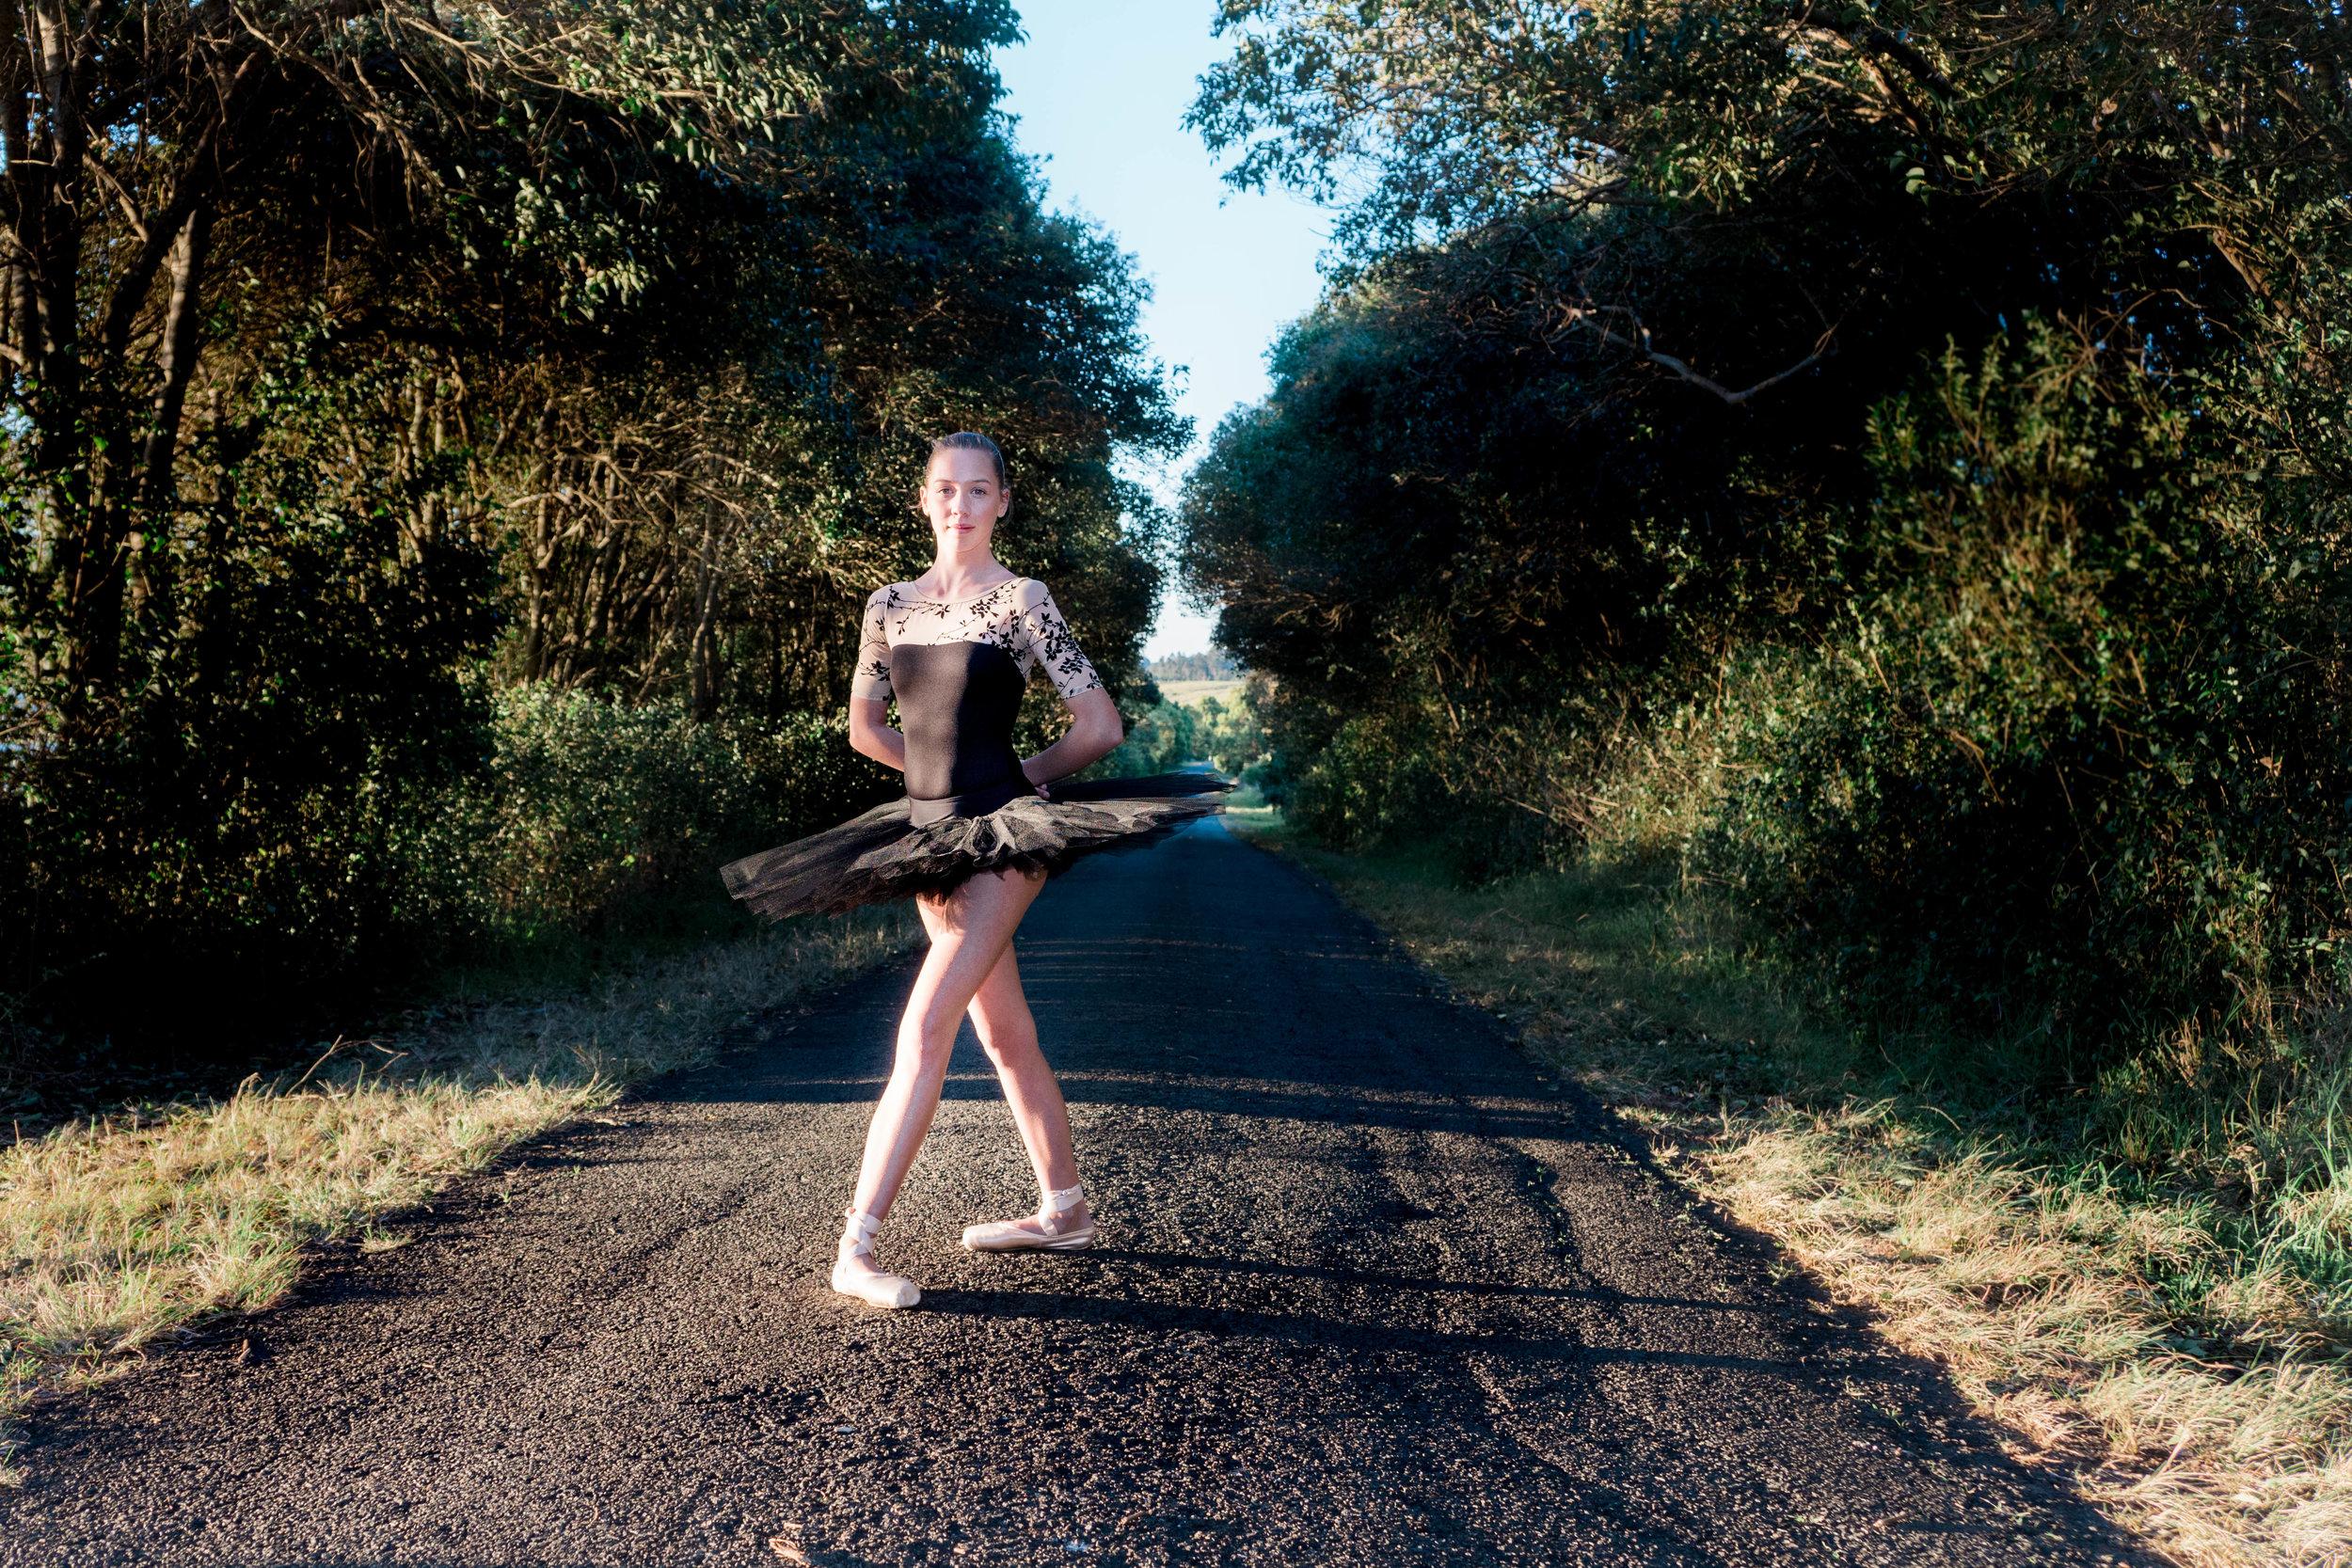 Hinterland-Dance-20.08.17-41.jpg